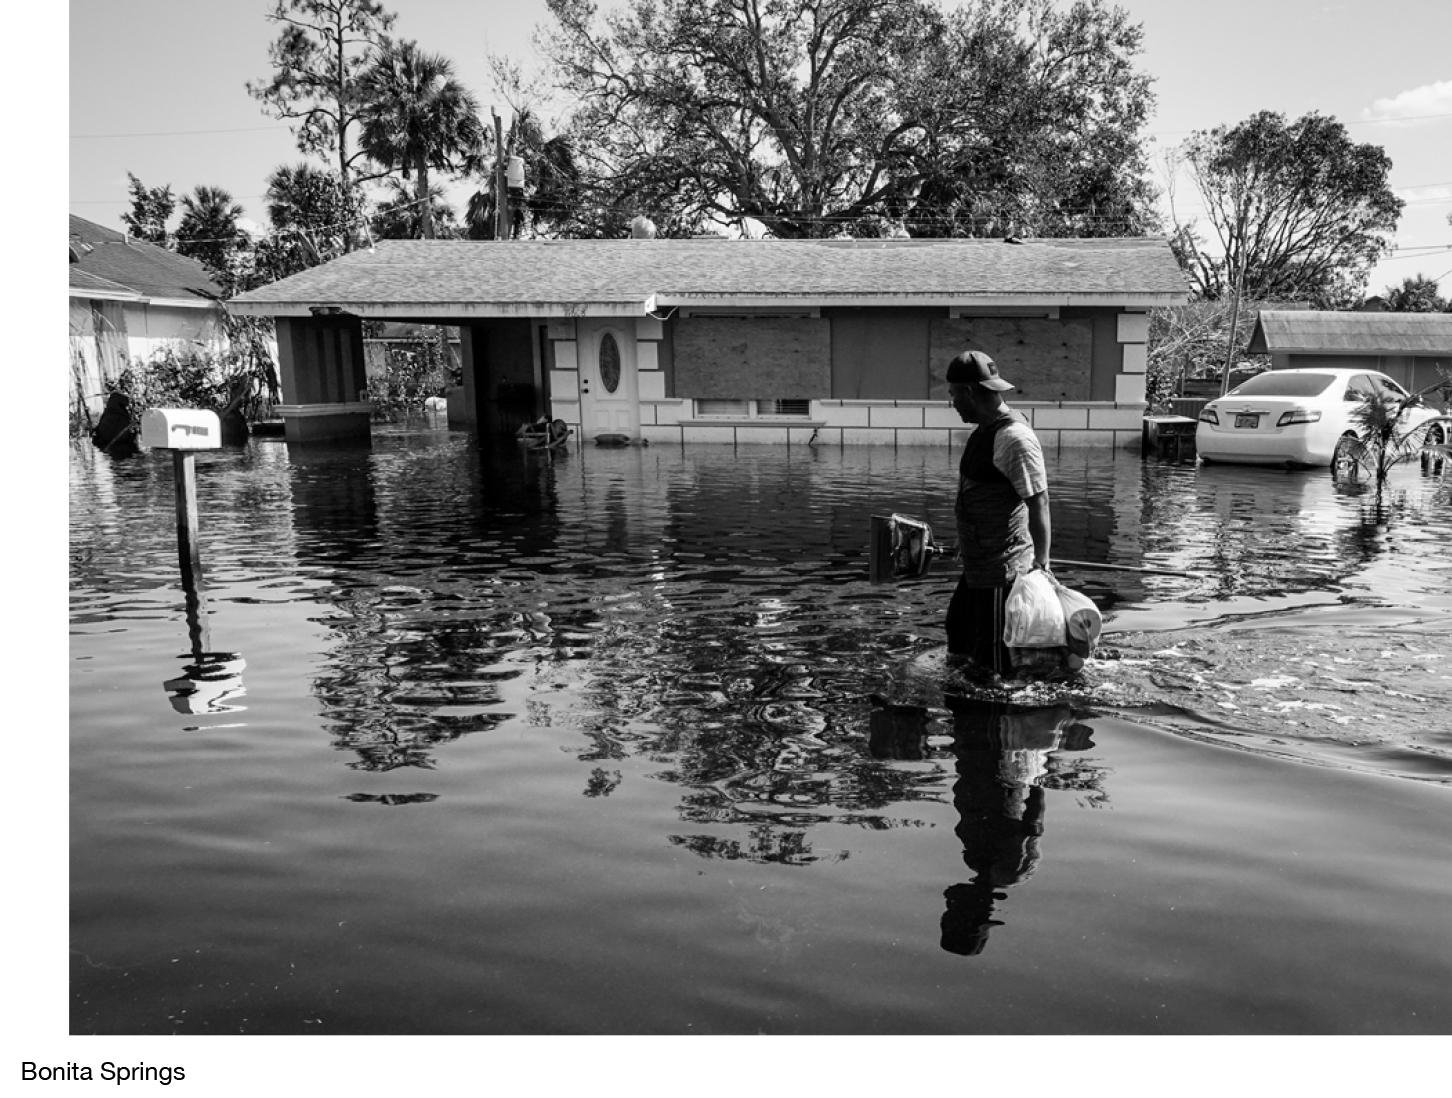 Robert LeBlanc Hurricane Irma %22Welcome To Paradise%22-4.jpg